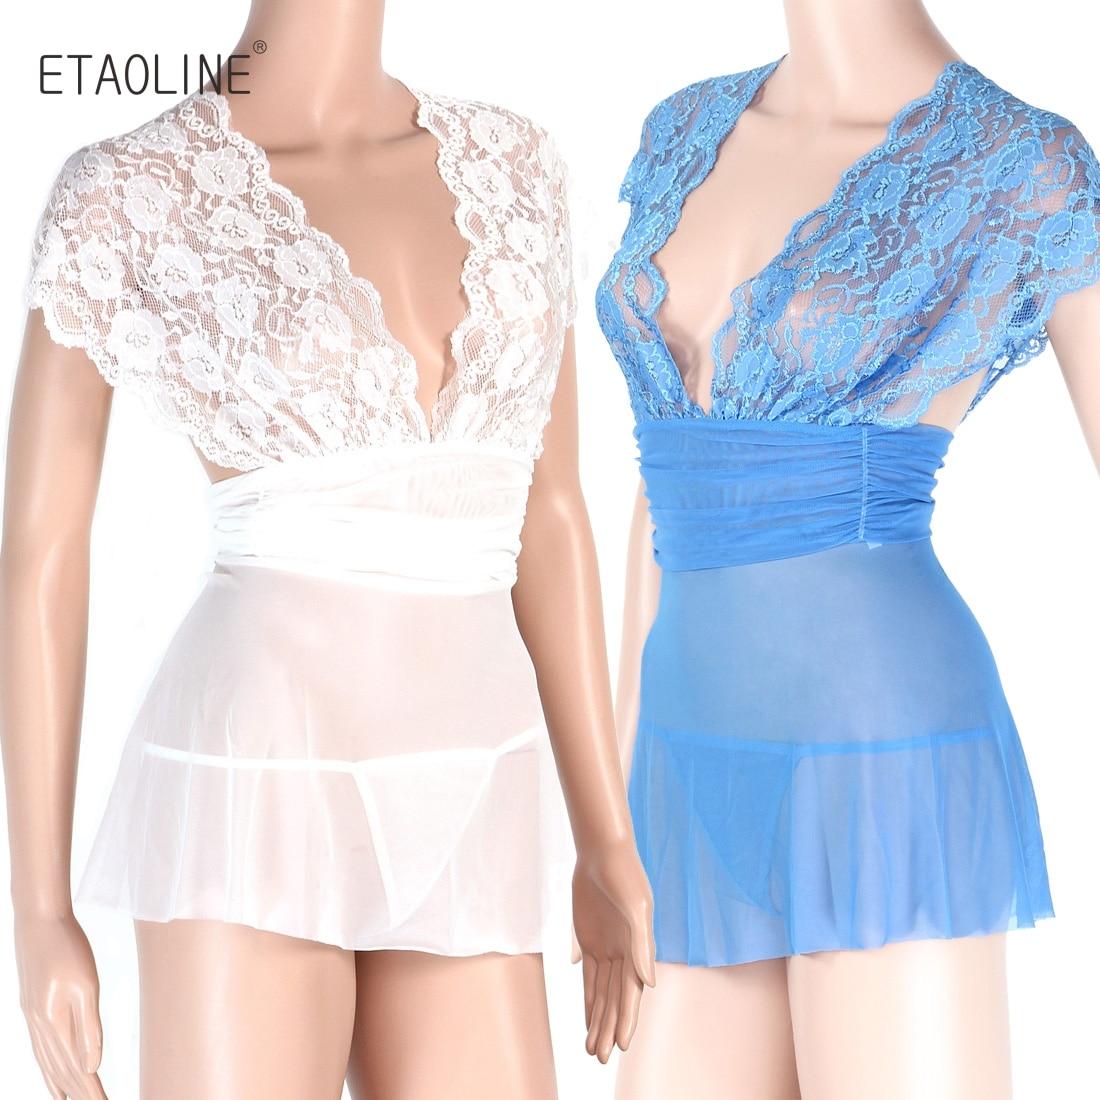 Womens Sleepwear Kimono Satin Robe Bathrobe Bath Robes Babydoll Nighties Night dress Home Sleepwear Nightgown Dressing Gown R04